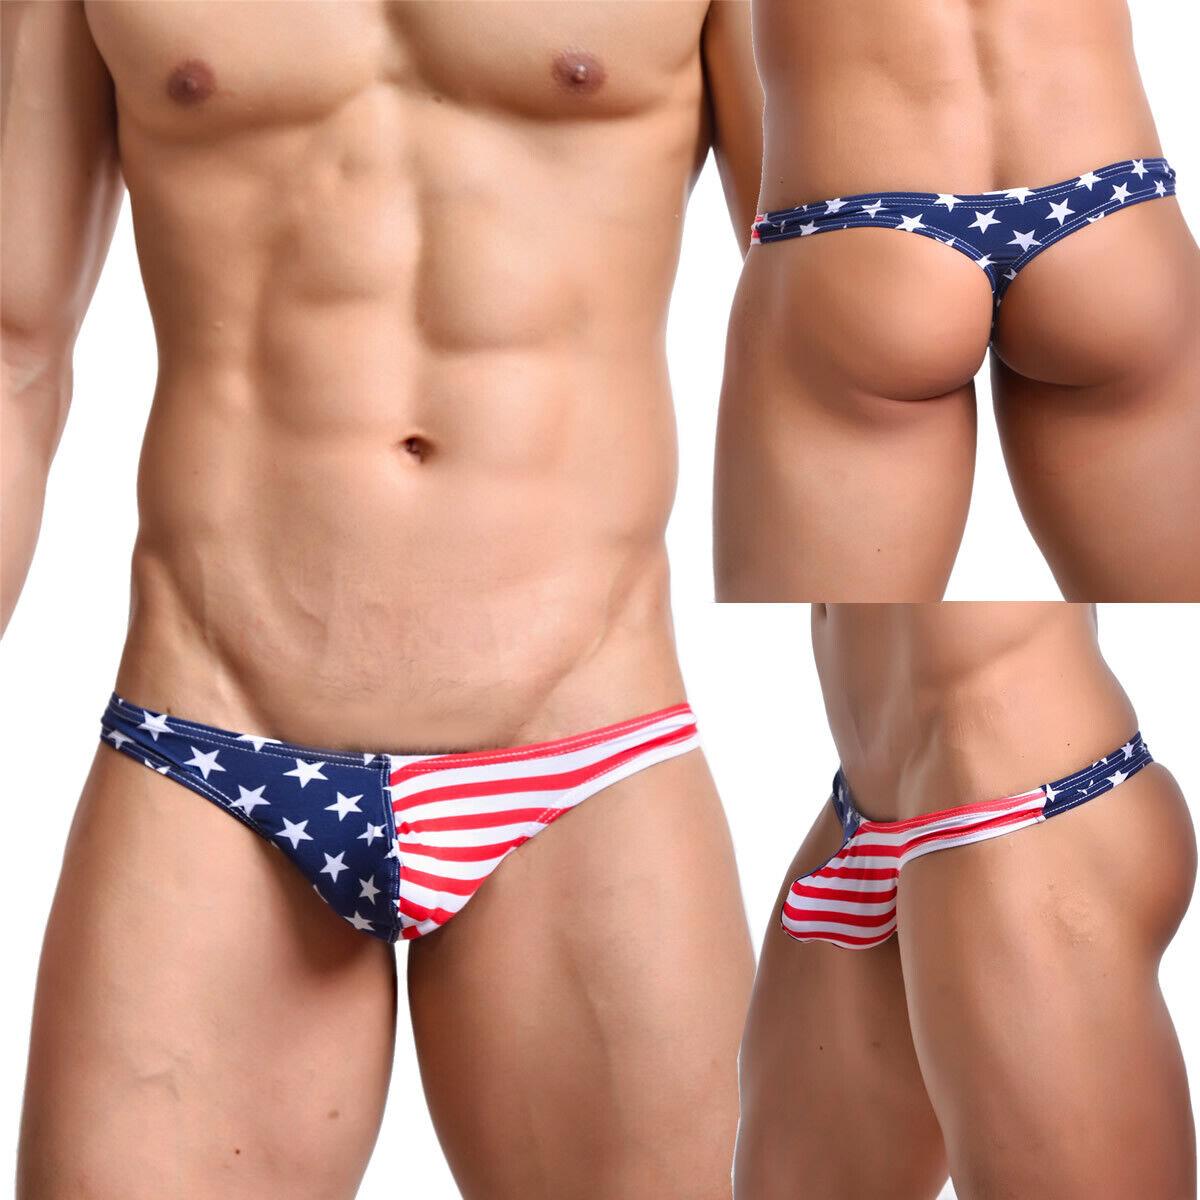 Details about Men's Stripes G-String Thong USA Flag Stars Bikini Lingerie  Underwear Underpants